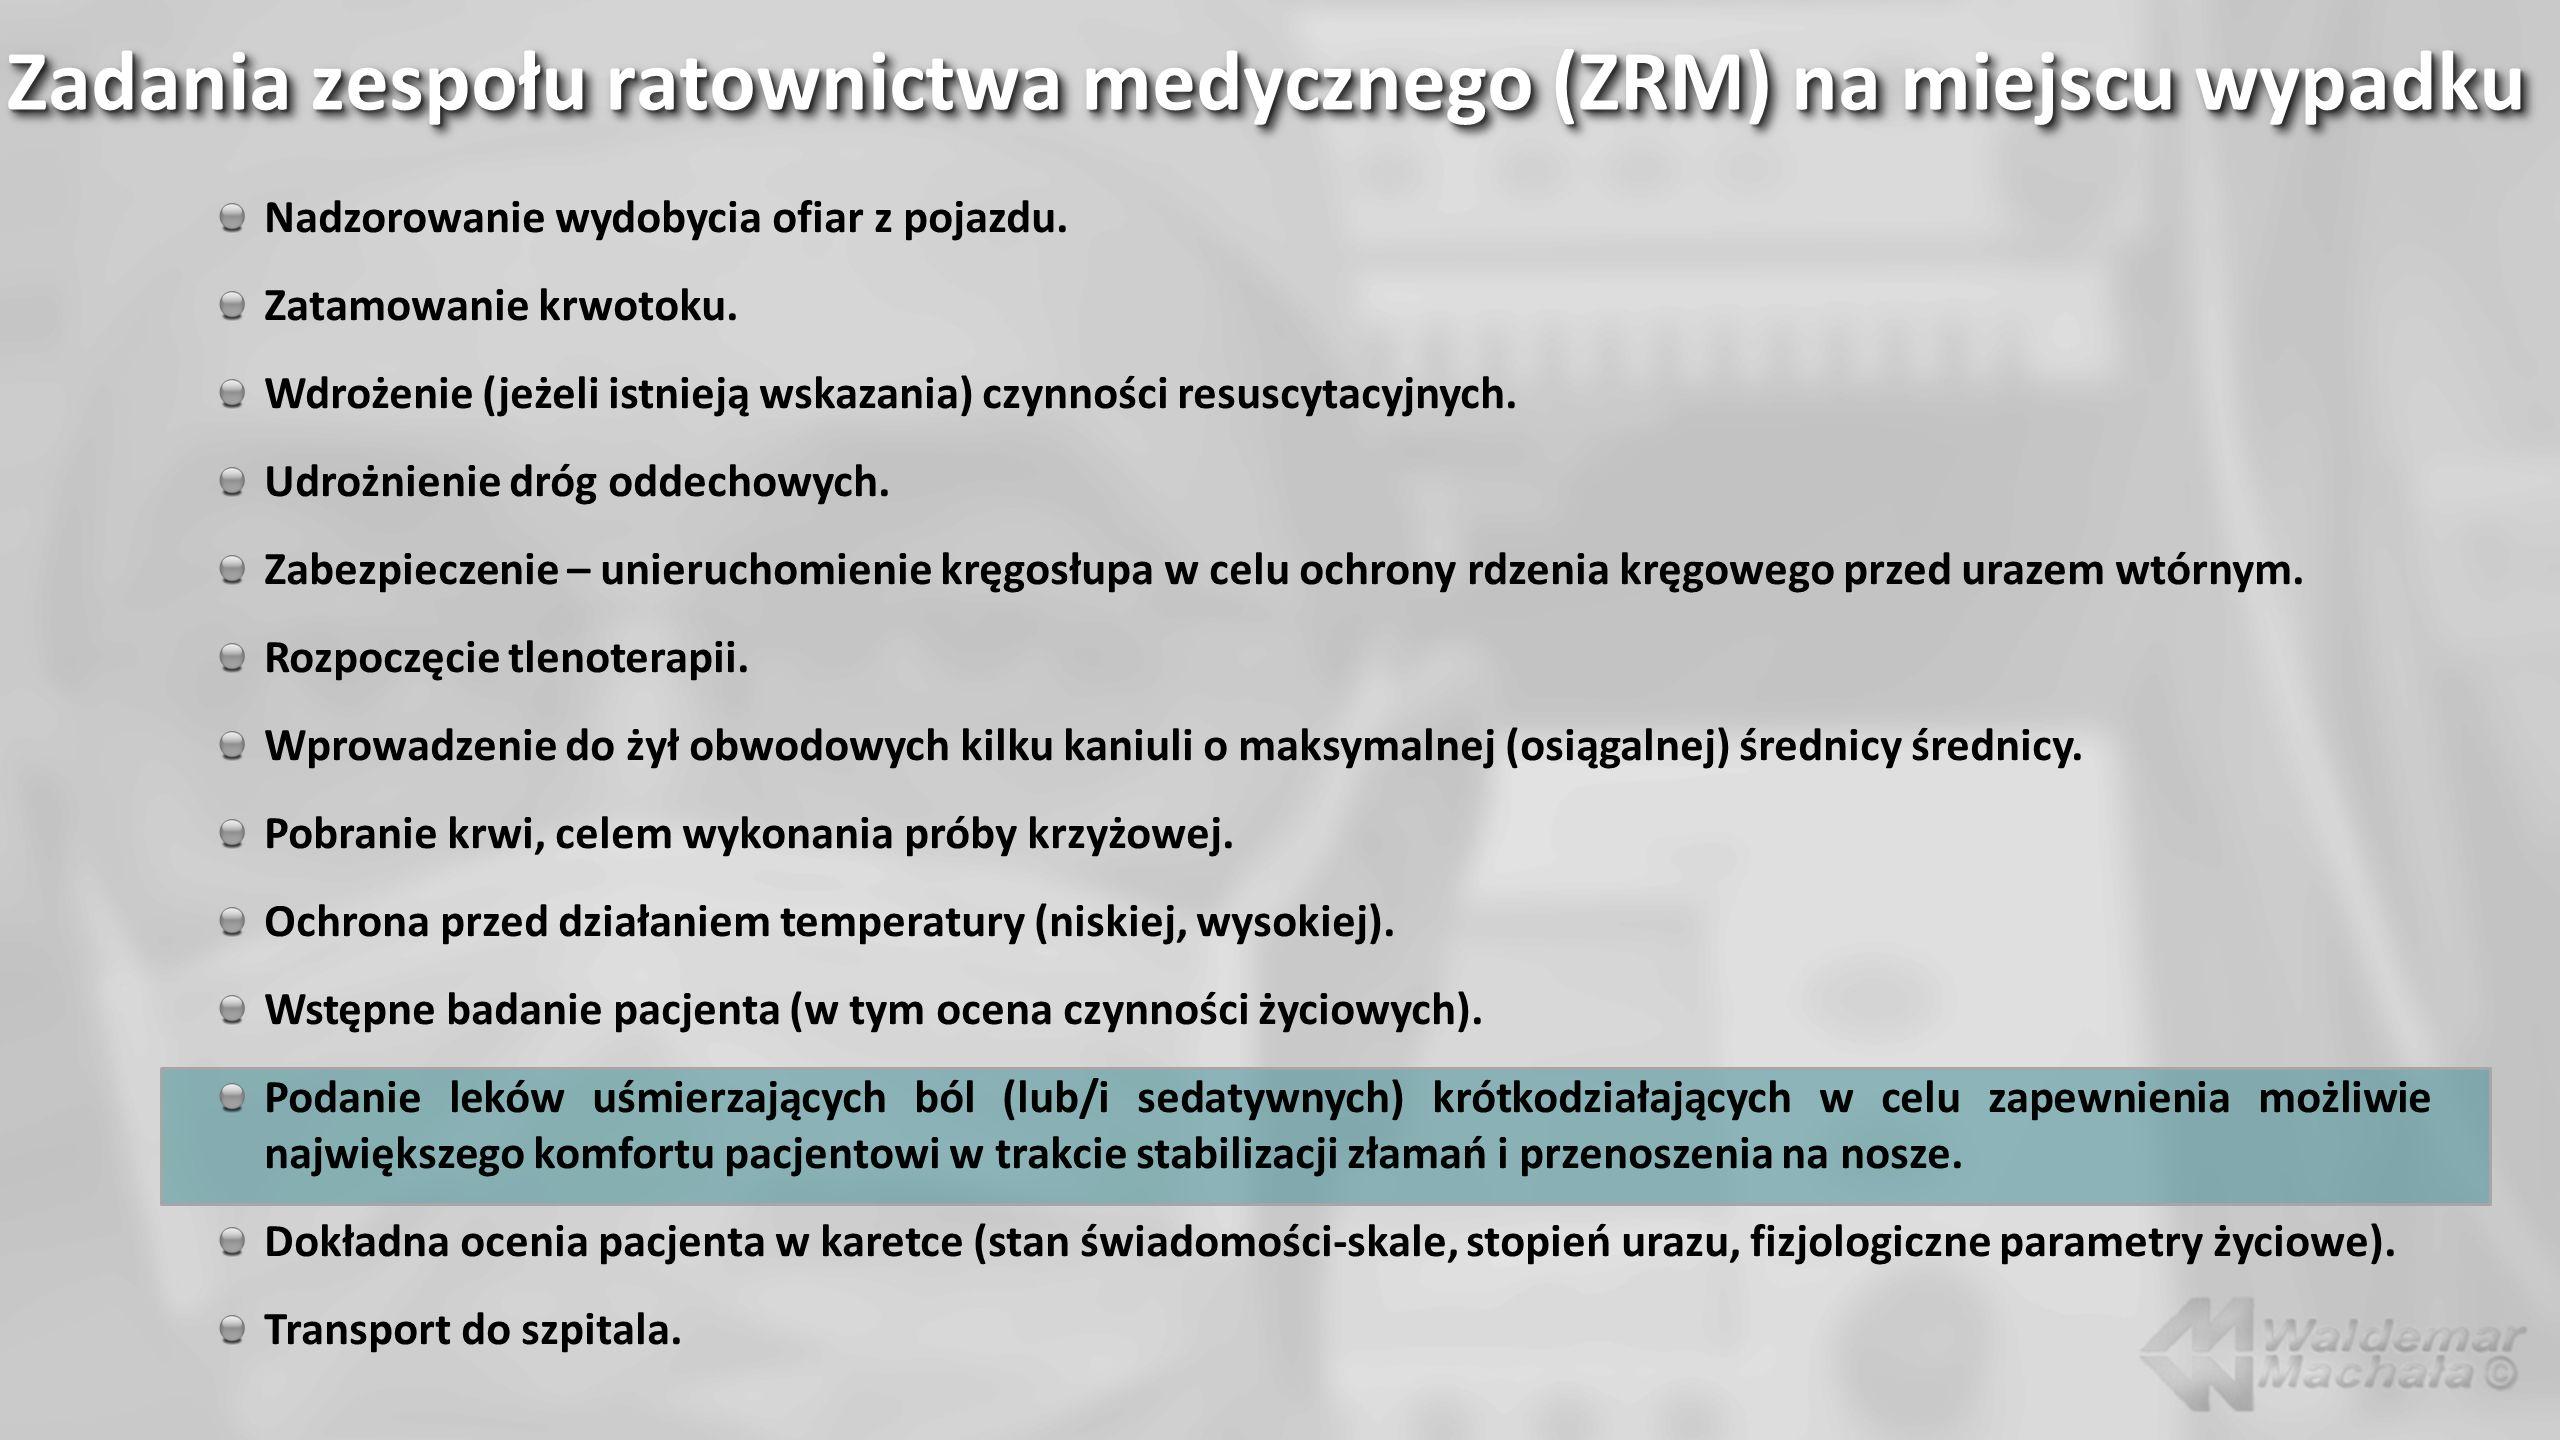 Barbiturany Tiopental (1 ml = 25 mg) Strzykawka 10 ml Tiopental (1 ml = 50 mg) Strzykawka 10 ml